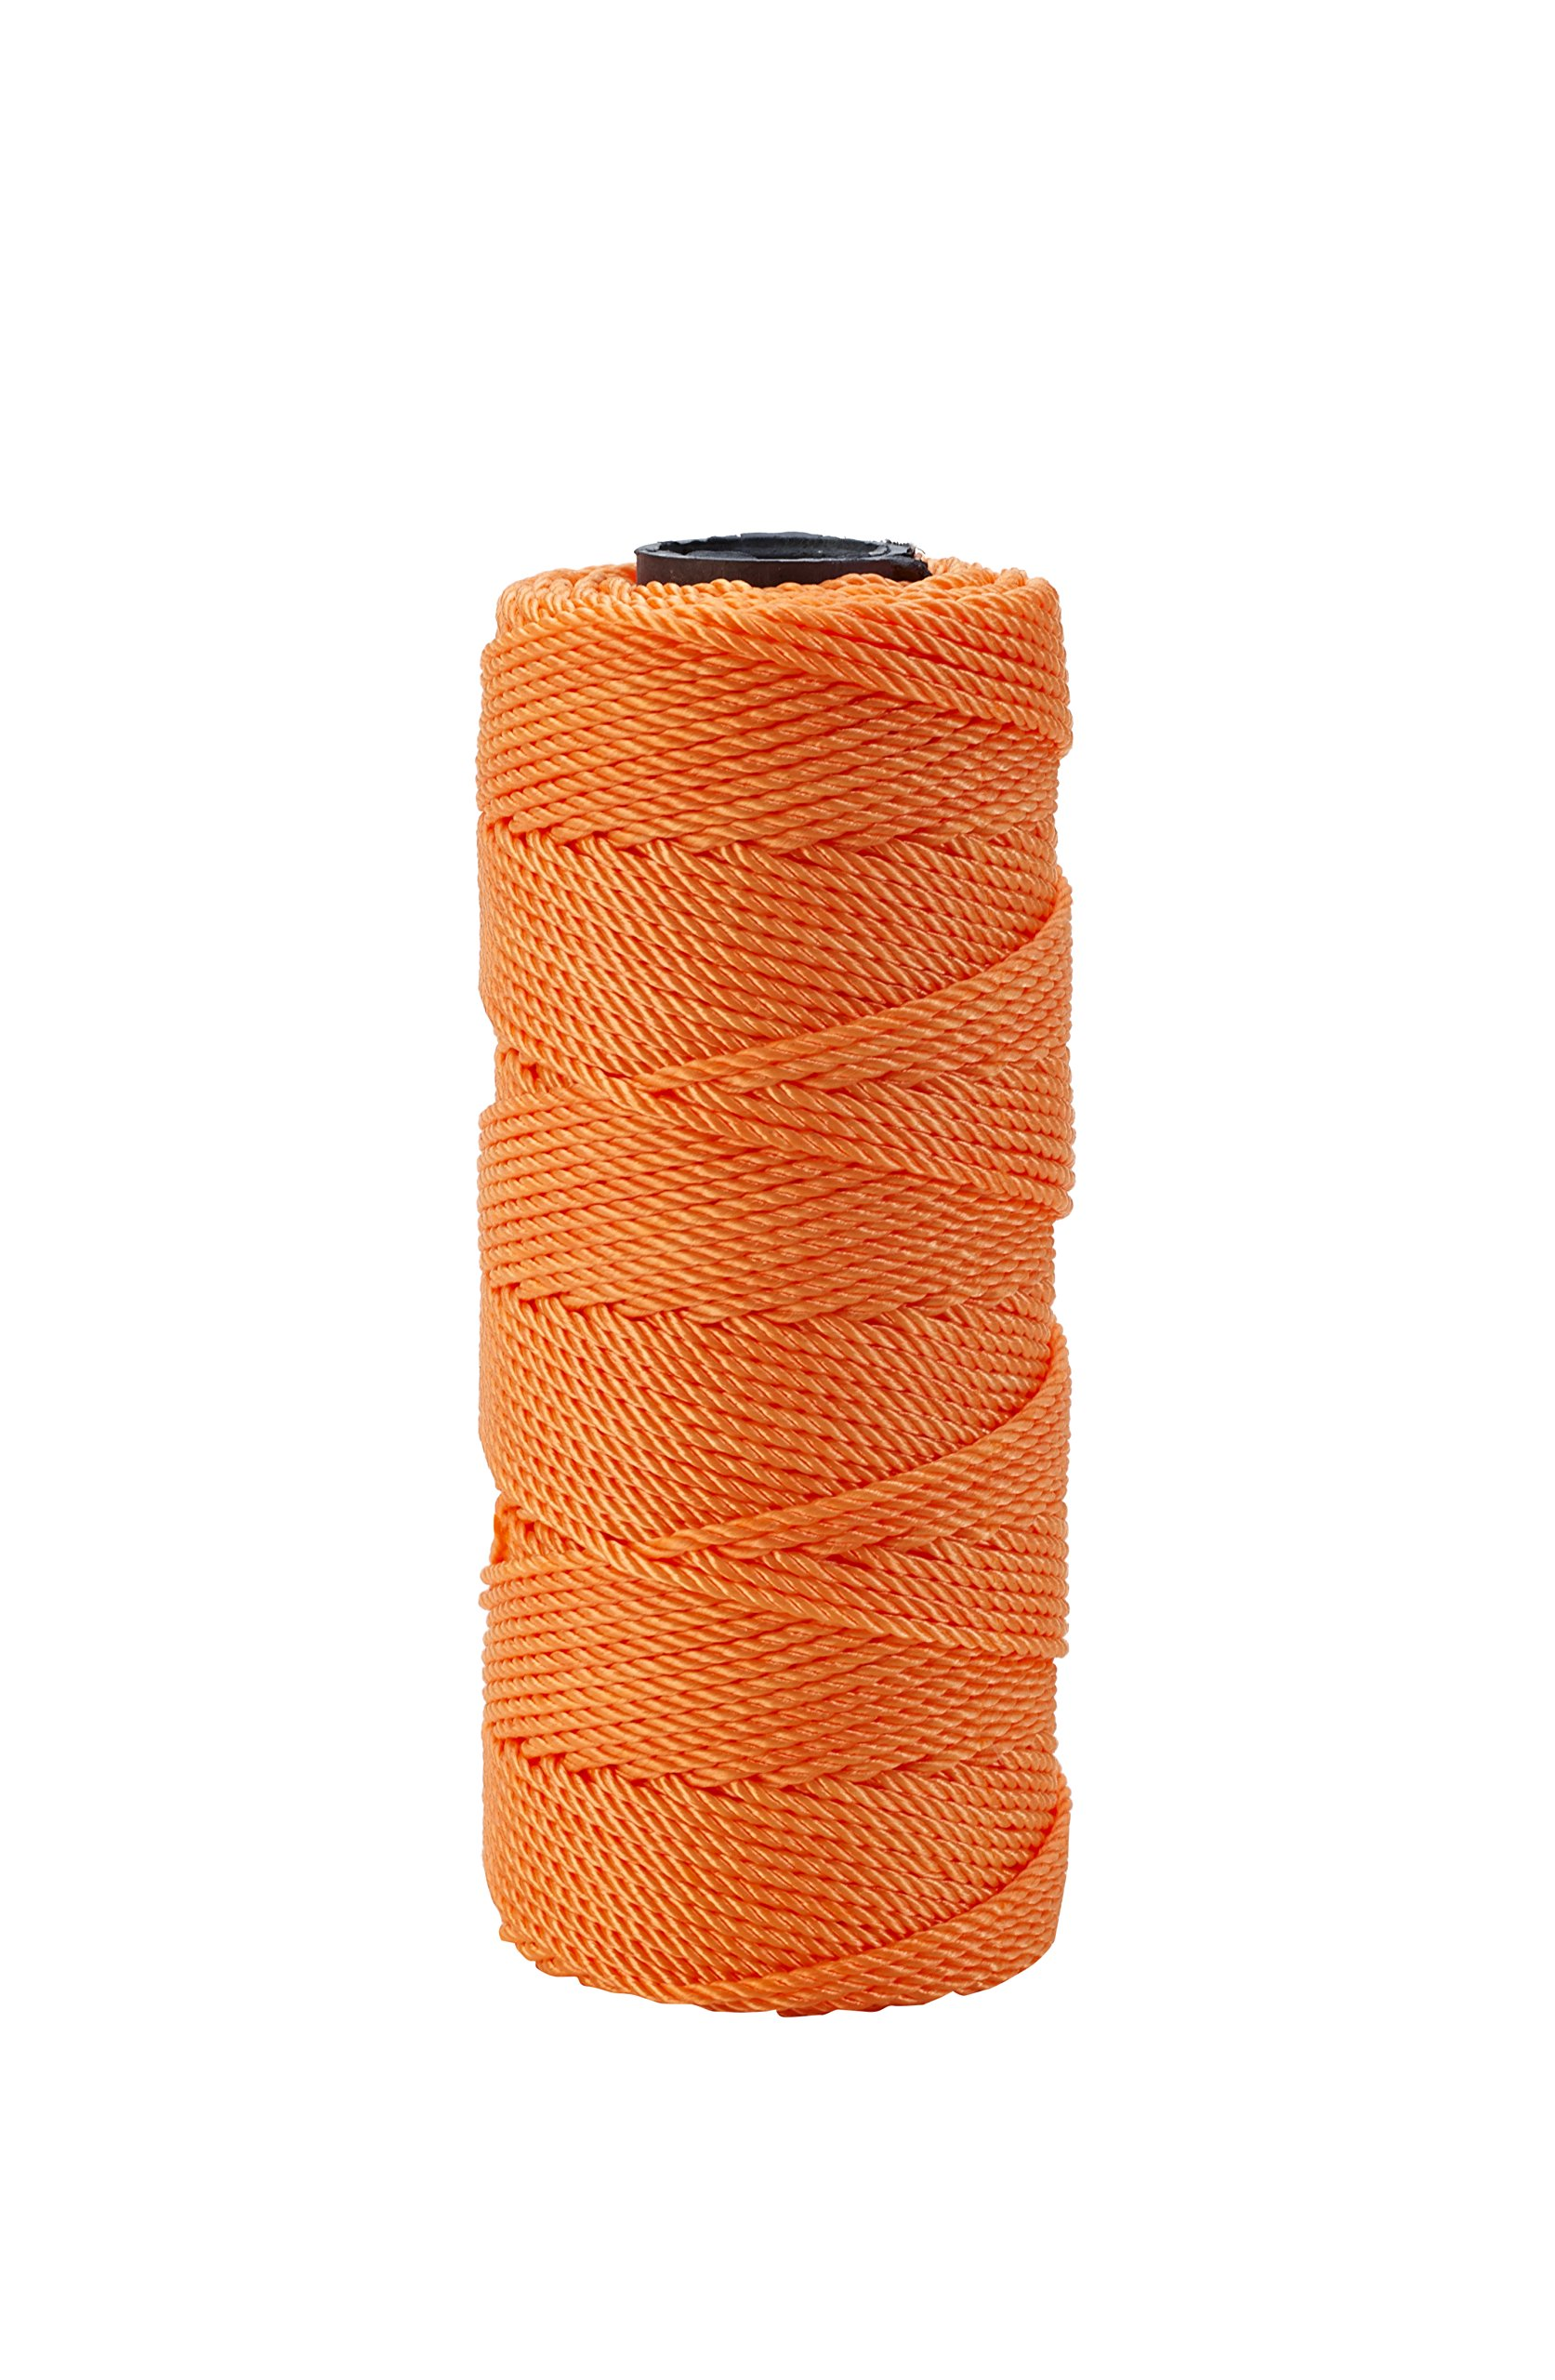 Mutual Industries 14661-145-1090 Nylon Mason Twine, 1 lb. Twisted, 18 x 1090', Glo Orange (Pack of 4)